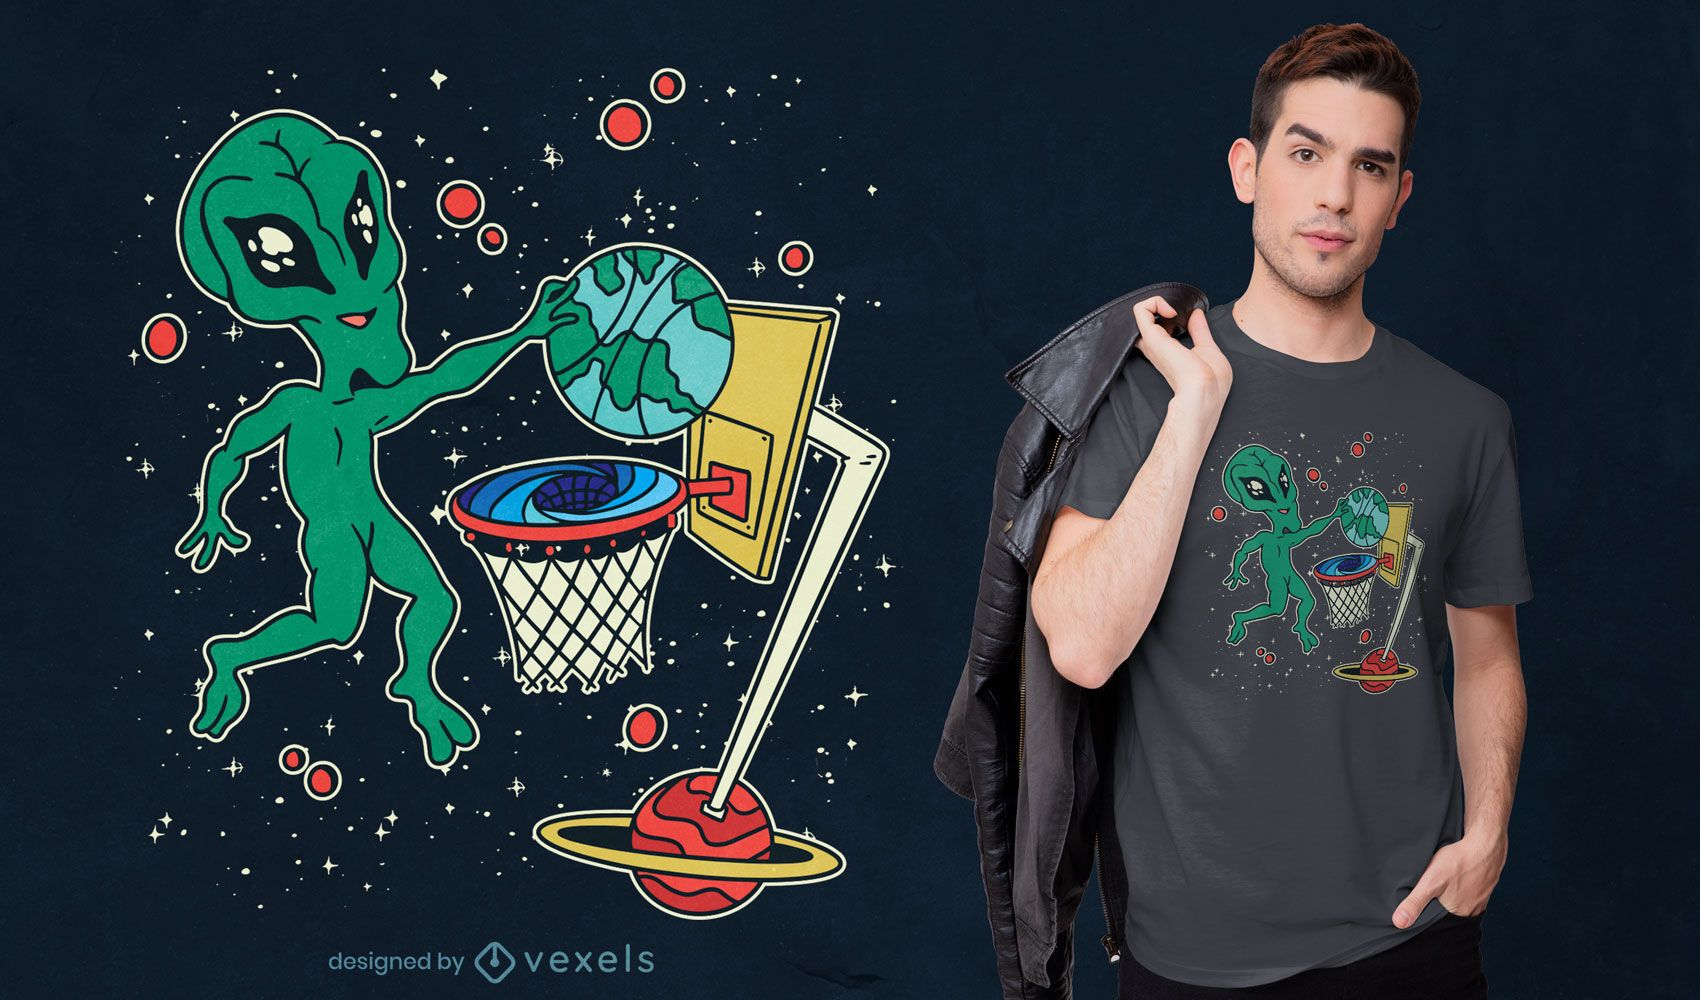 Alien playing space basketball t-shirt design